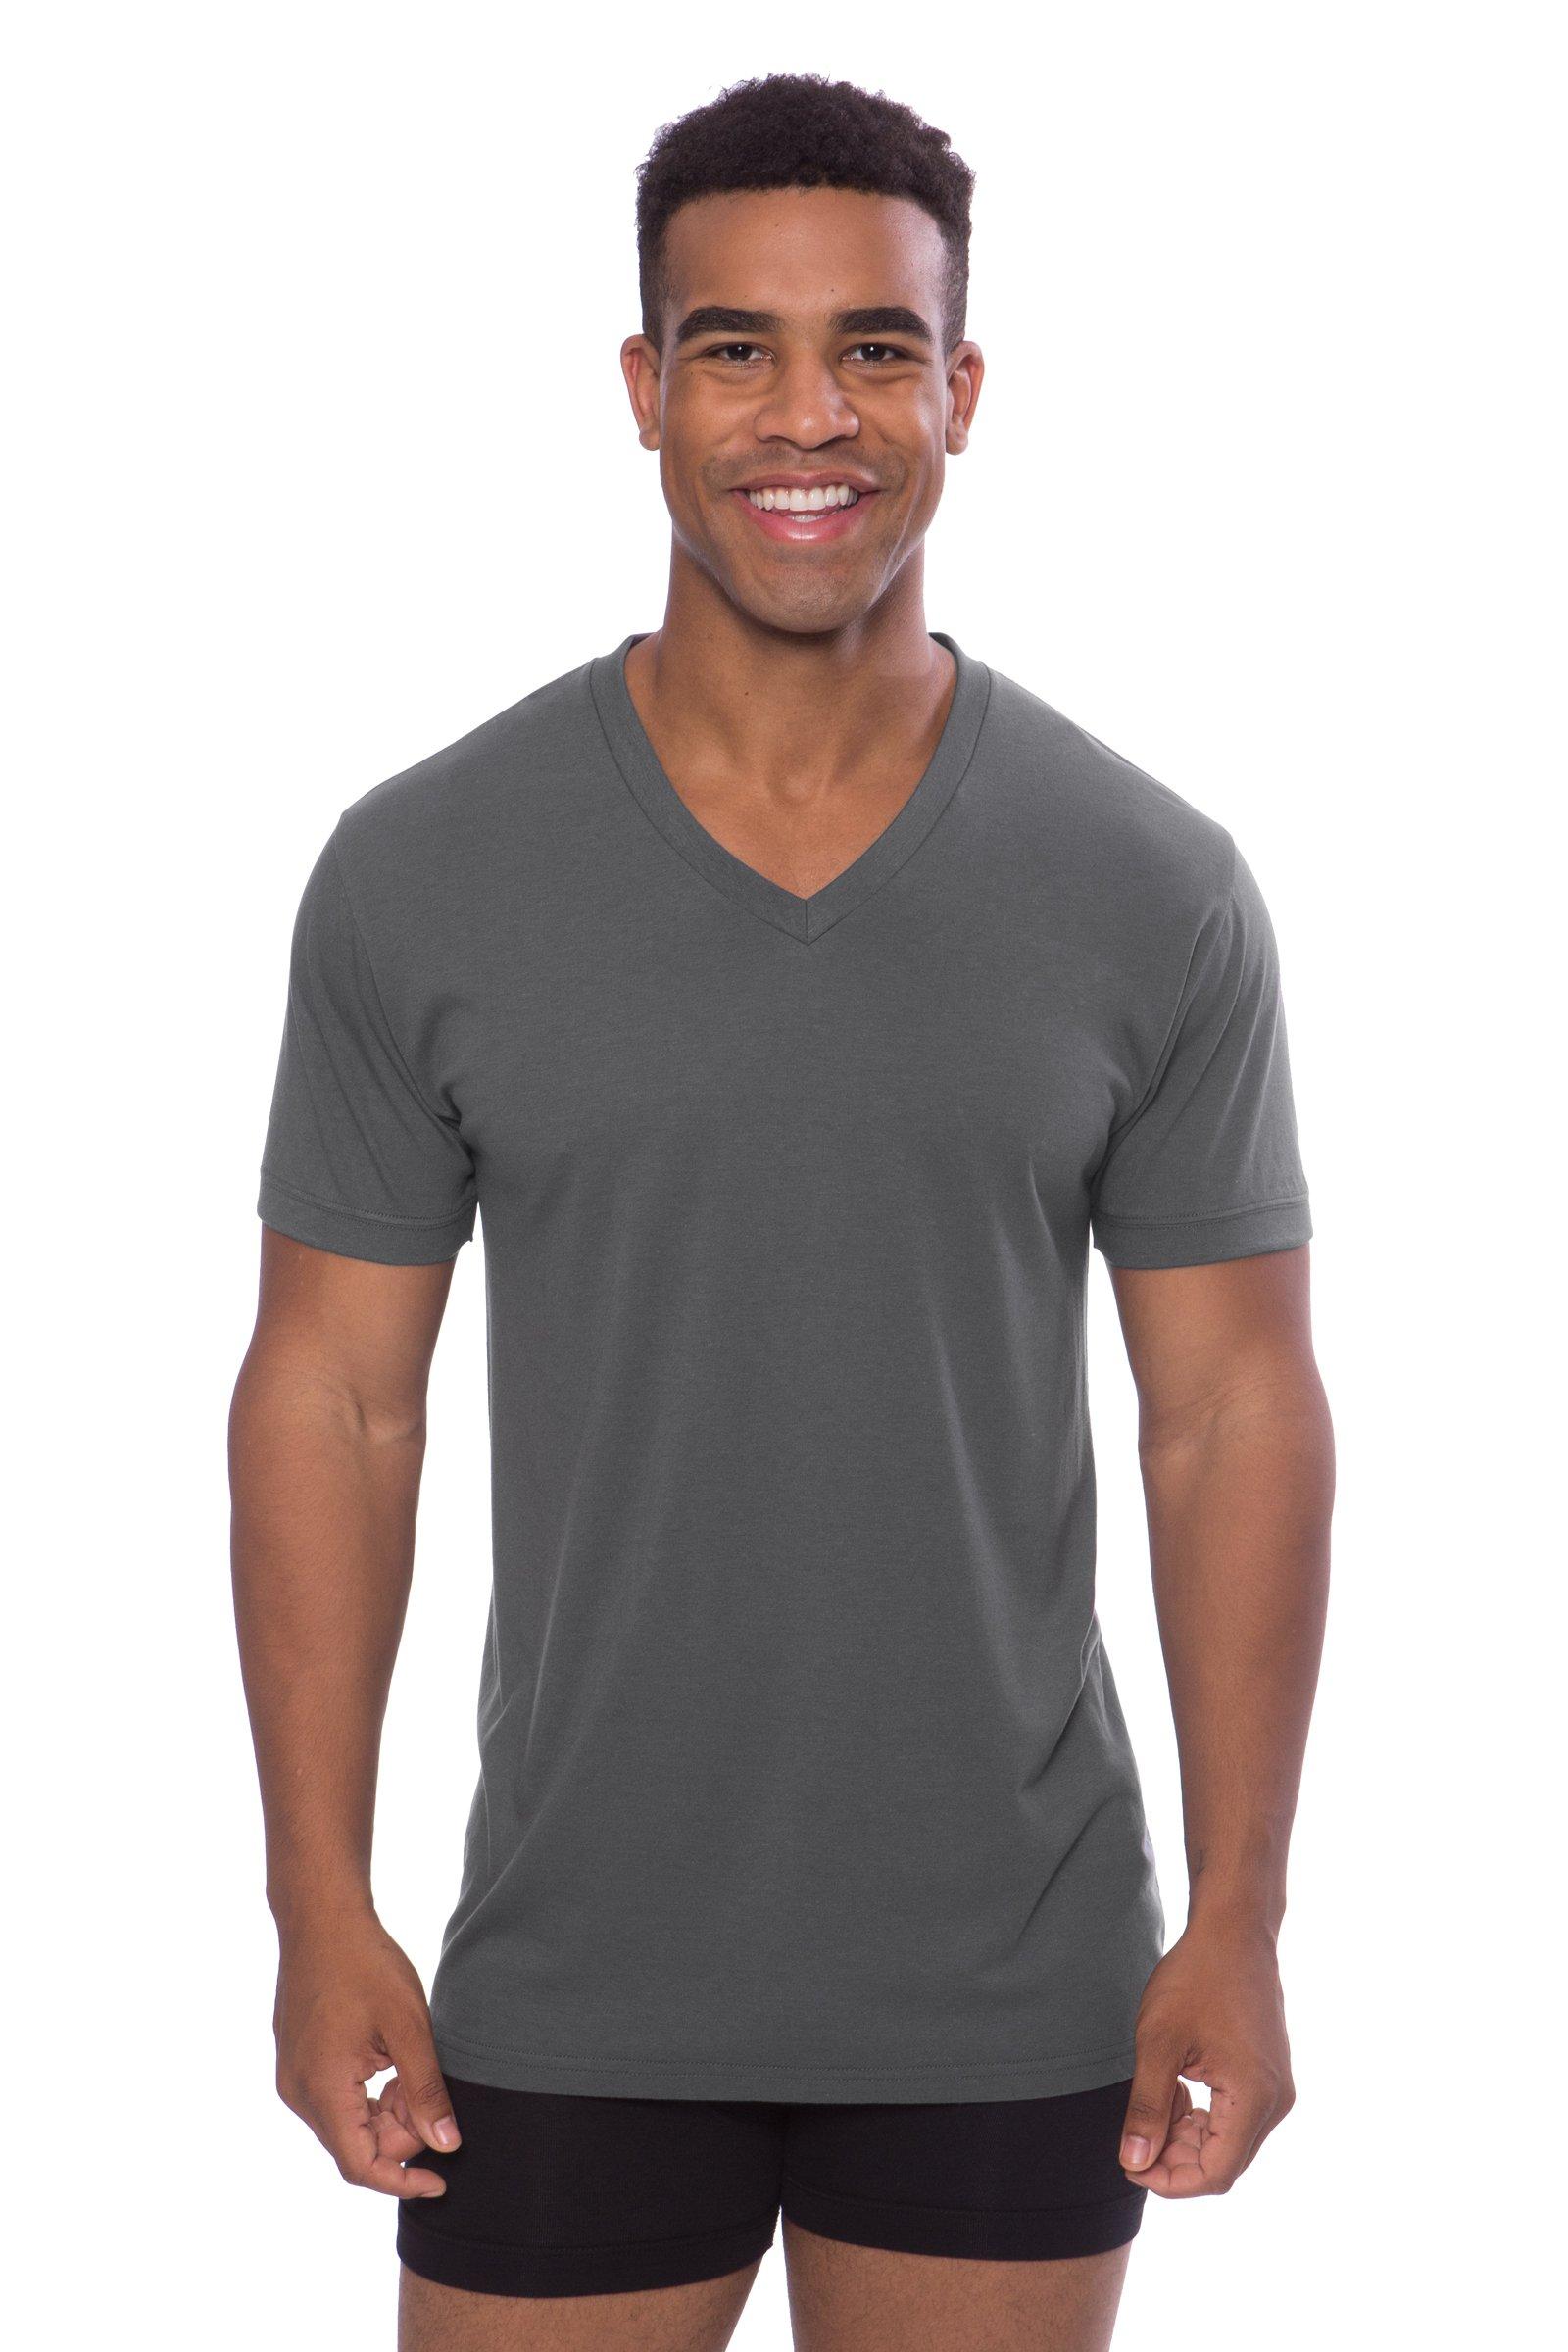 Texere Men's V-Neck Luxury Undershirt (Meio, Charcoal, XXLT) Great Sleepwear by TexereSilk